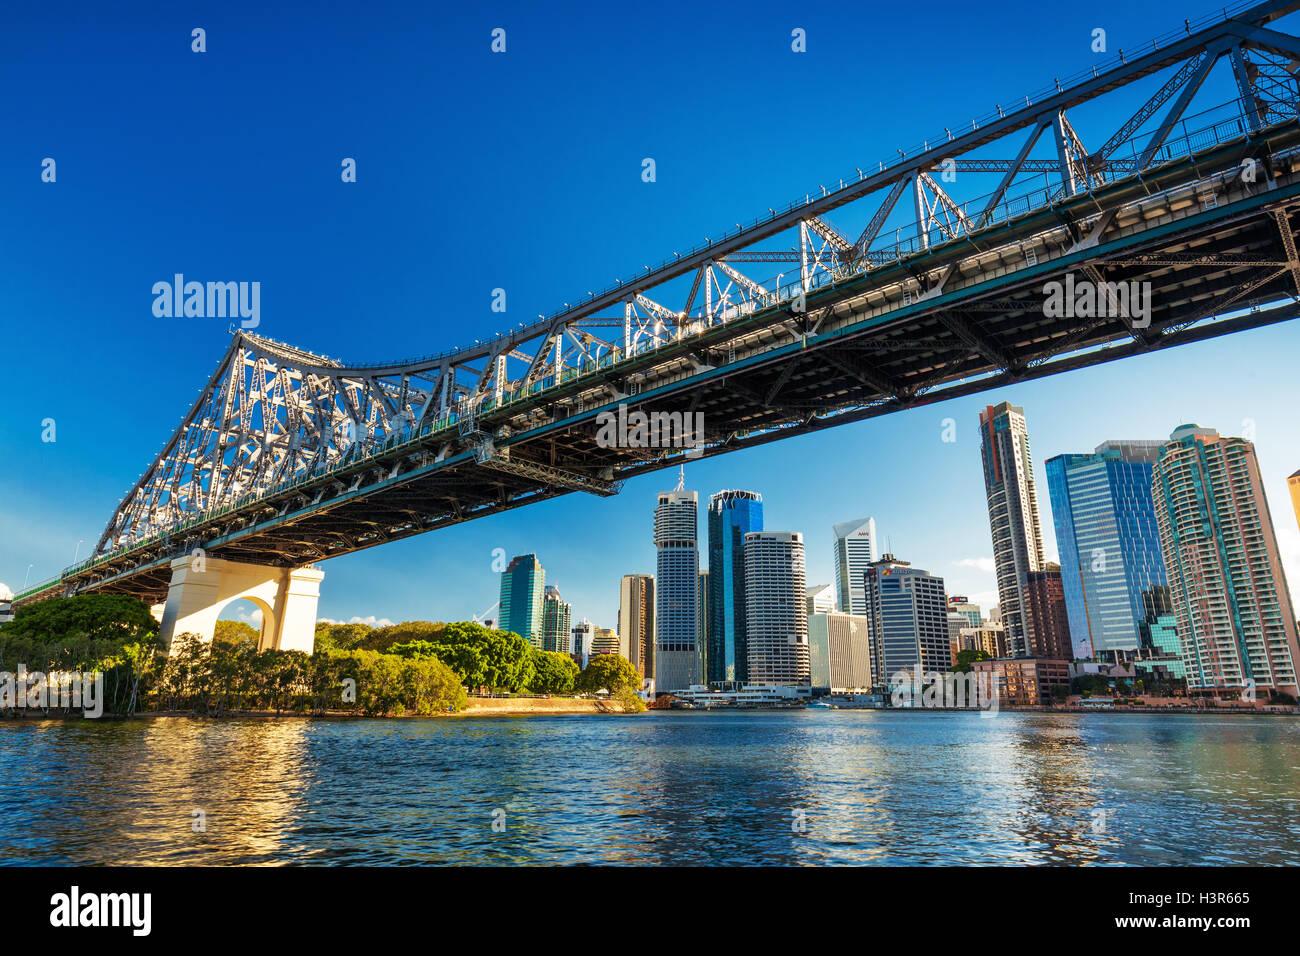 BRISBANE, AUS - AUG 10 2016: Brisbane Skyline with Story Bridge and the river. It is Australias third largest city, - Stock Image